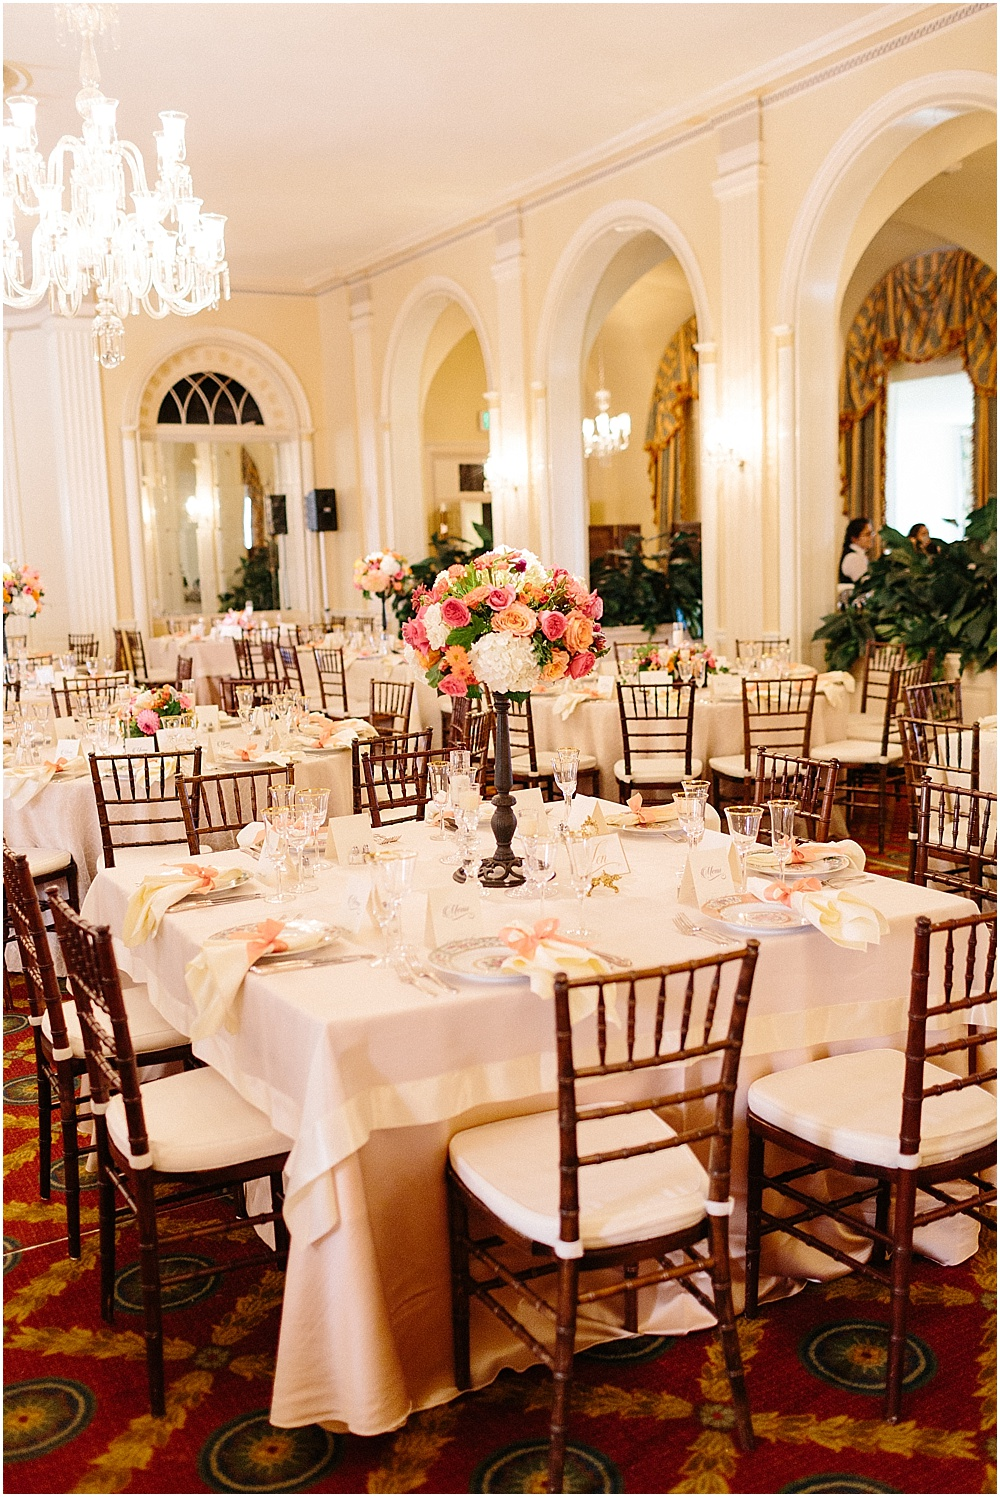 Vane_Baltimore_Country_Club_Wedding_Baltimore_Wedding_Photographer_0080